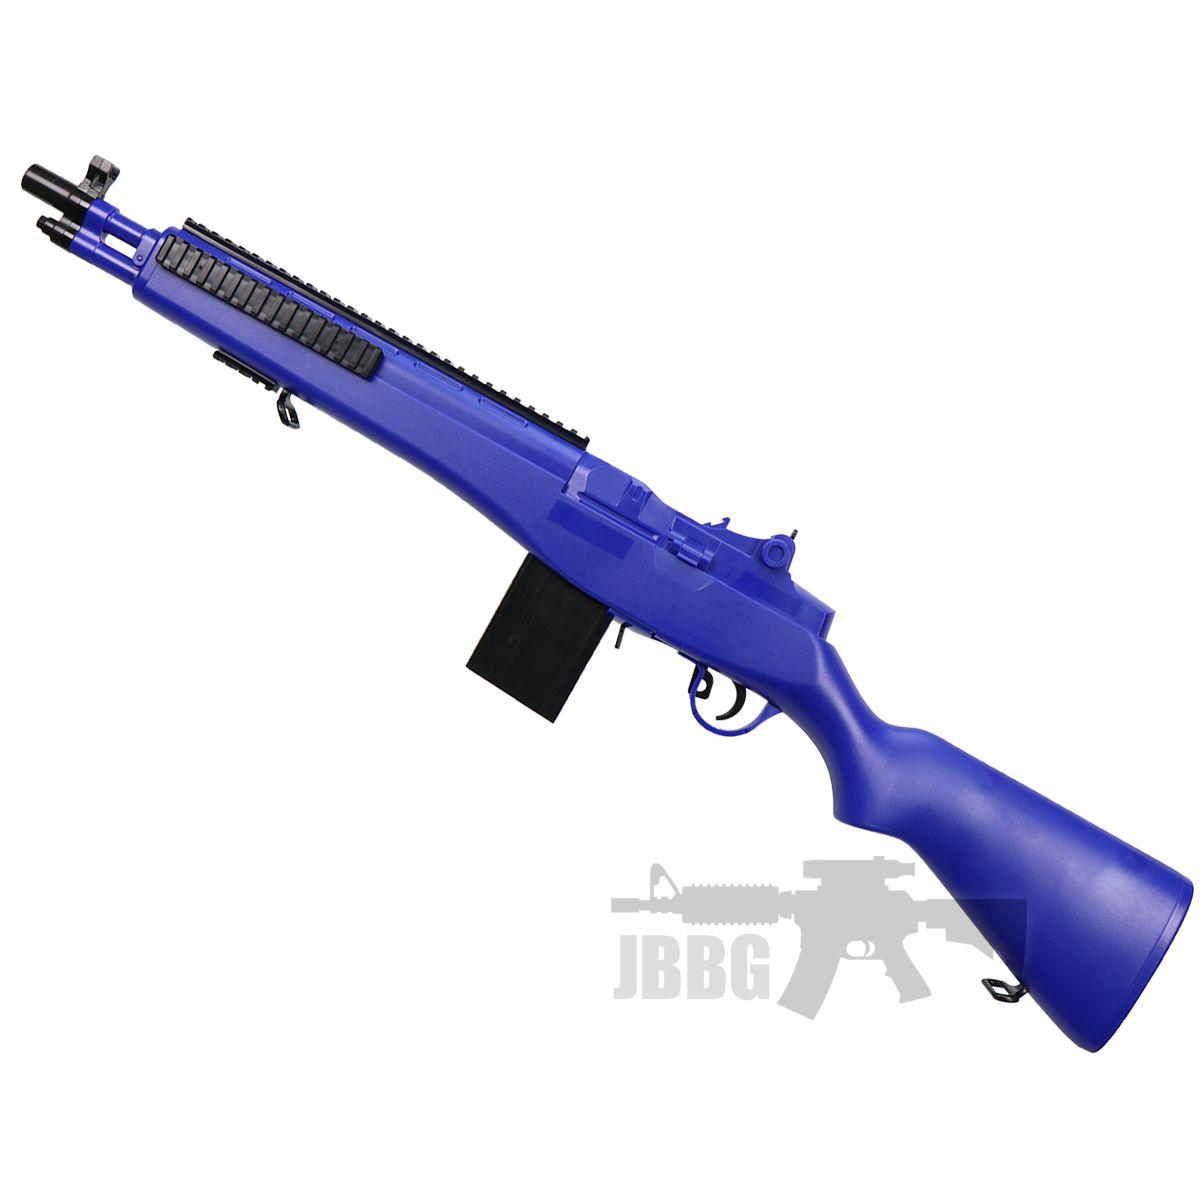 m14 gun 1